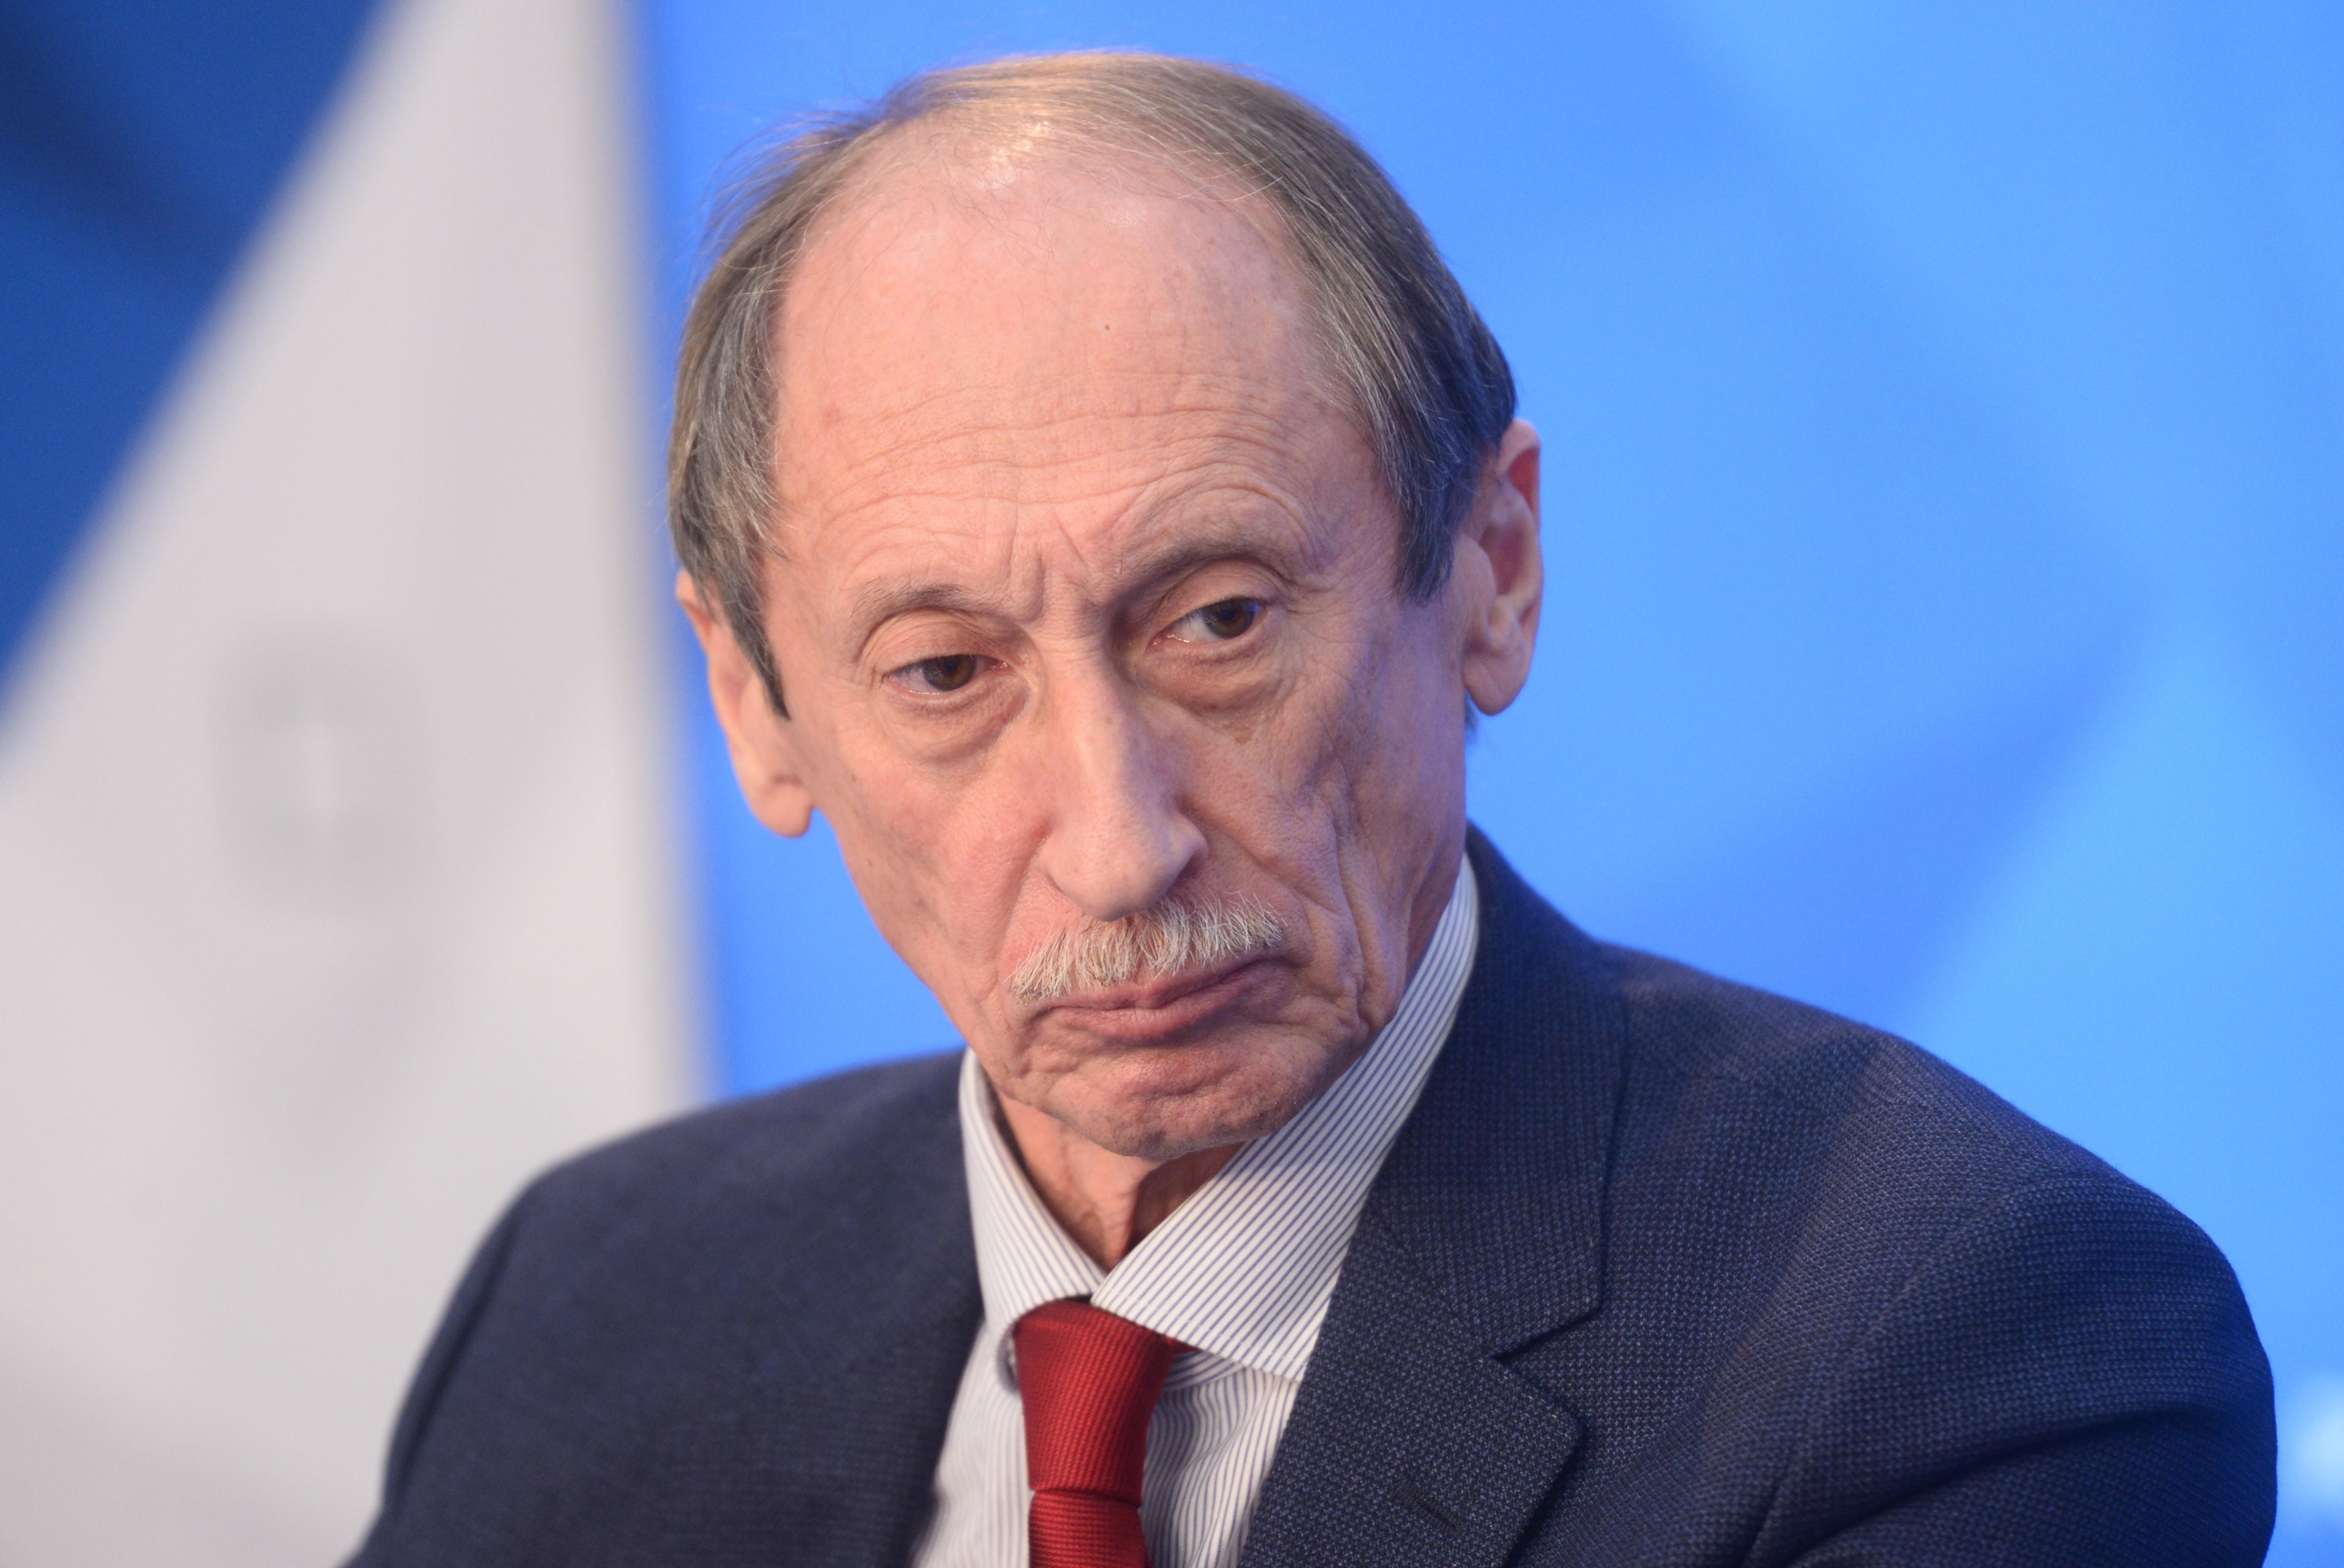 Валентин Балахничев. Фото © РИА Новости/Владимир Трефилов